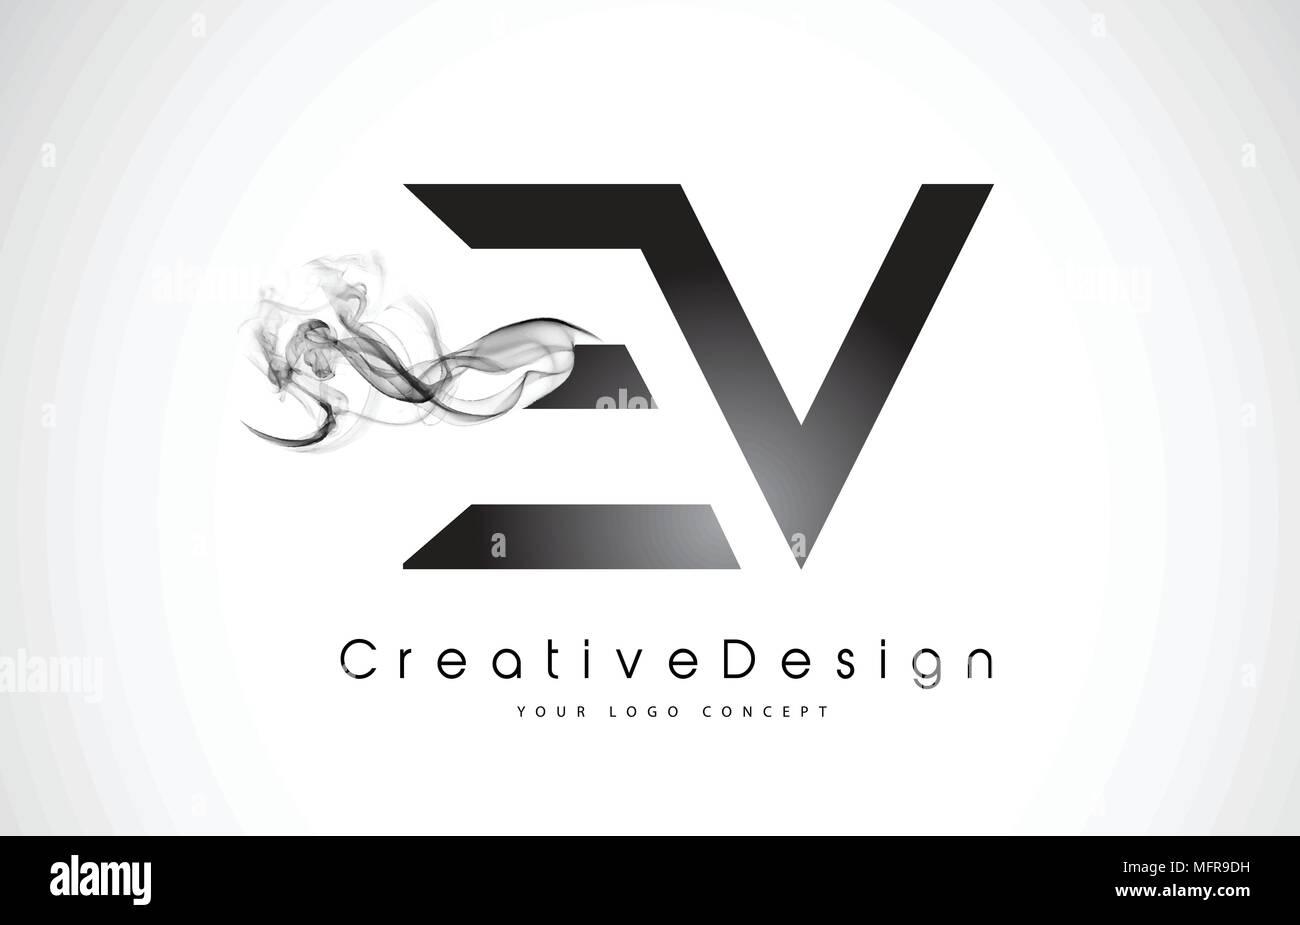 ev letter logo design with black smoke creative modern smoke letters vector icon logo illustration